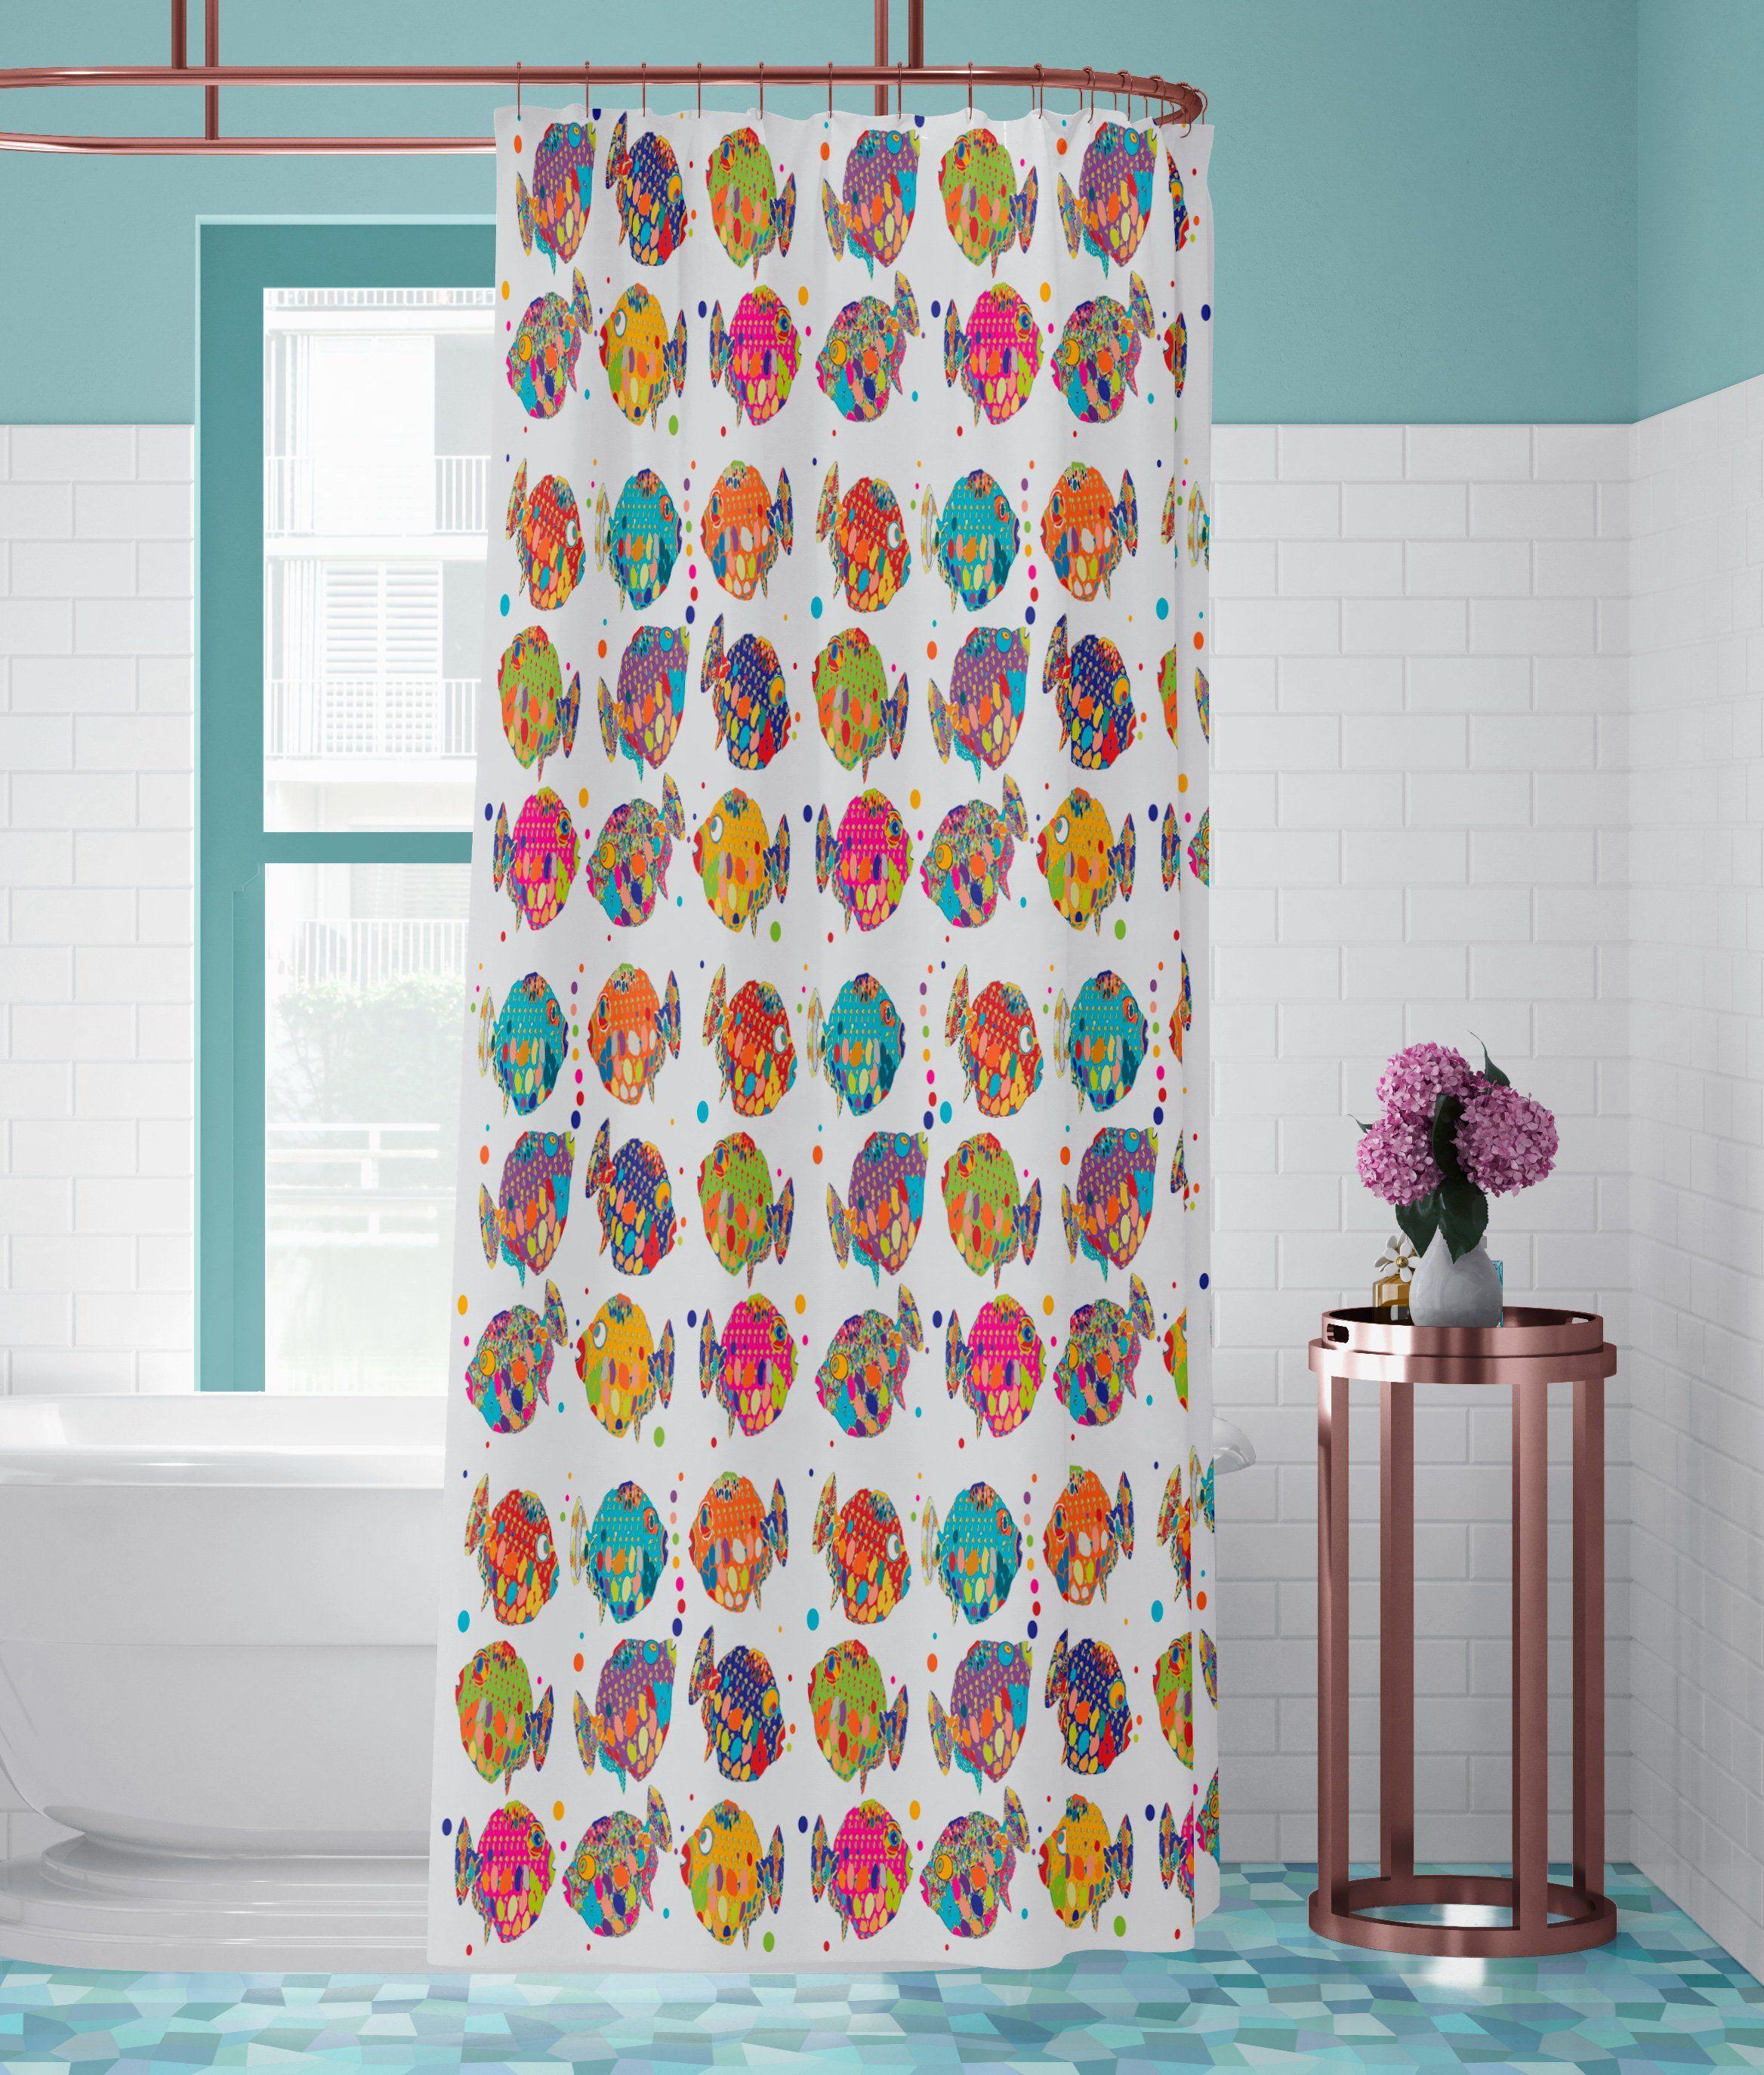 Tropical Fish Shower Curtain Beach Bathroom Decor Colorful Bath